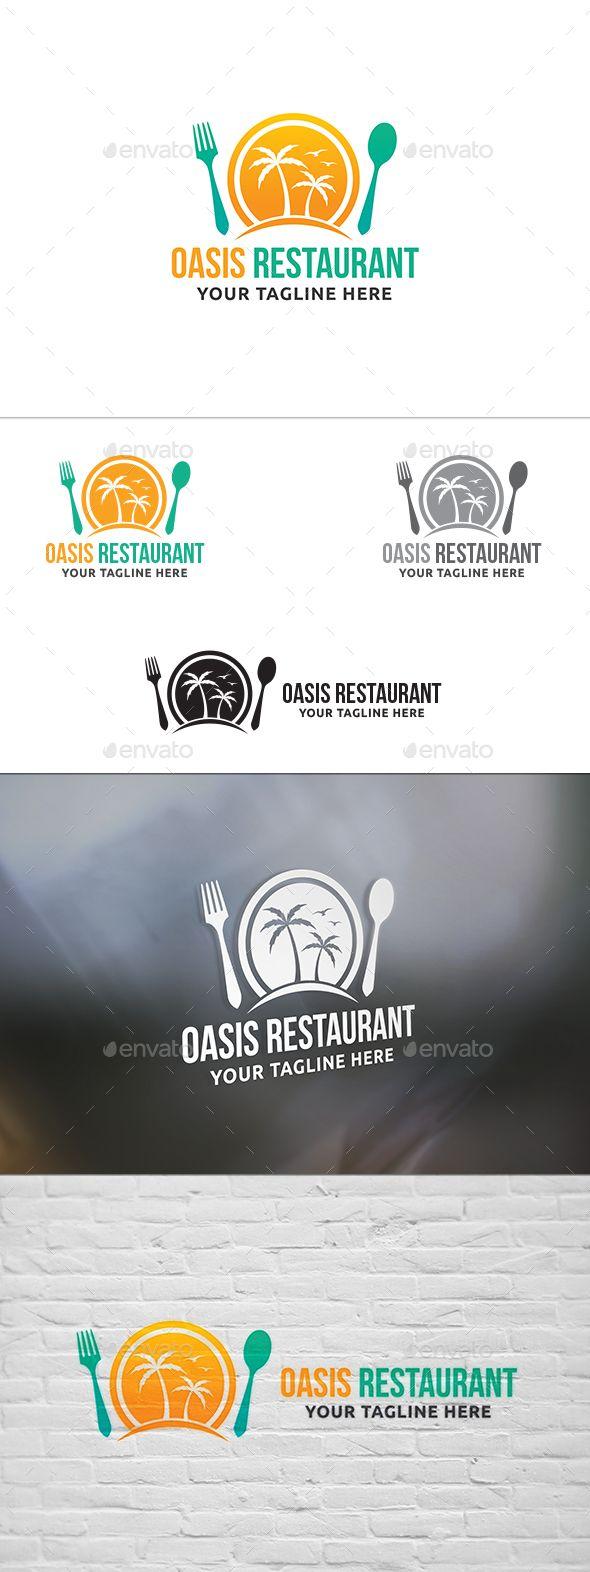 Oasis Restaurant Logo,accommodation, arabic food, beach, beach food, branding, creative, delicious, desert, food oasis, food point, fork, hotel, modern, oasis logo, oasis restaurant, palm, Palm Island, relax, Restaurant logo, sea, spoon, travel, tropical coconut tree, vacation